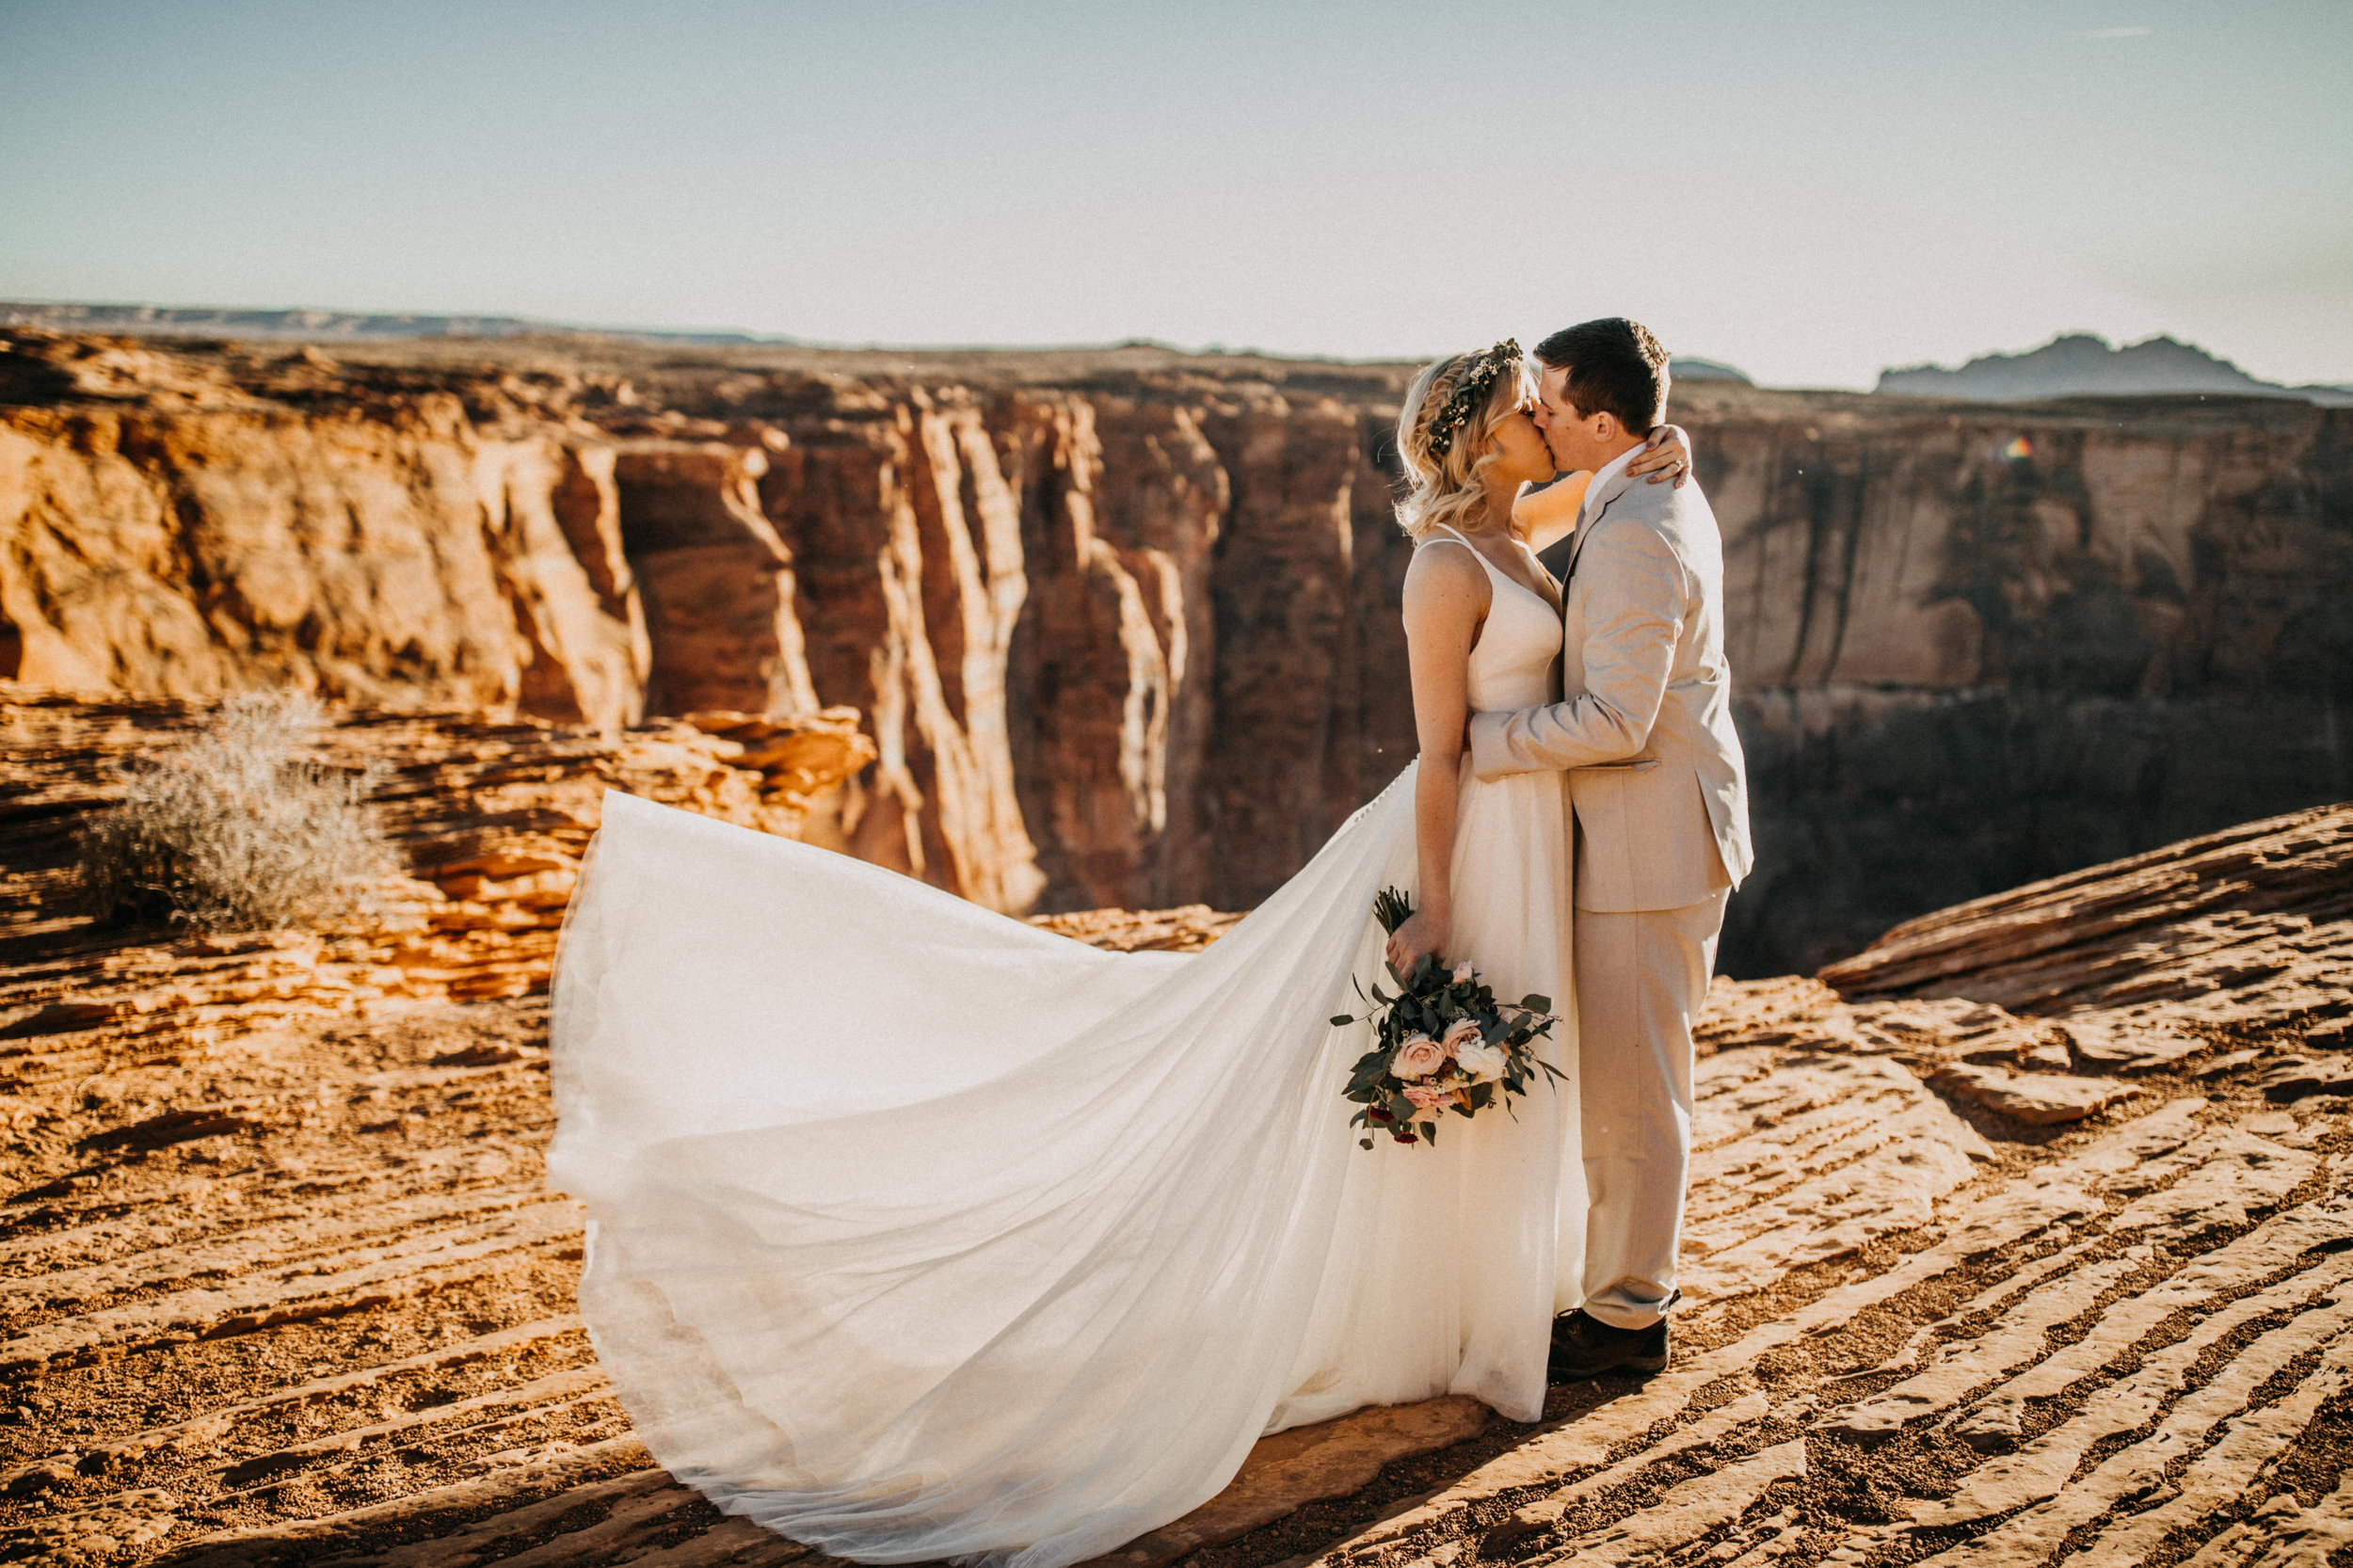 Callihan Arizona Portraits 2018 (JPEG) (89 of 124).jpg